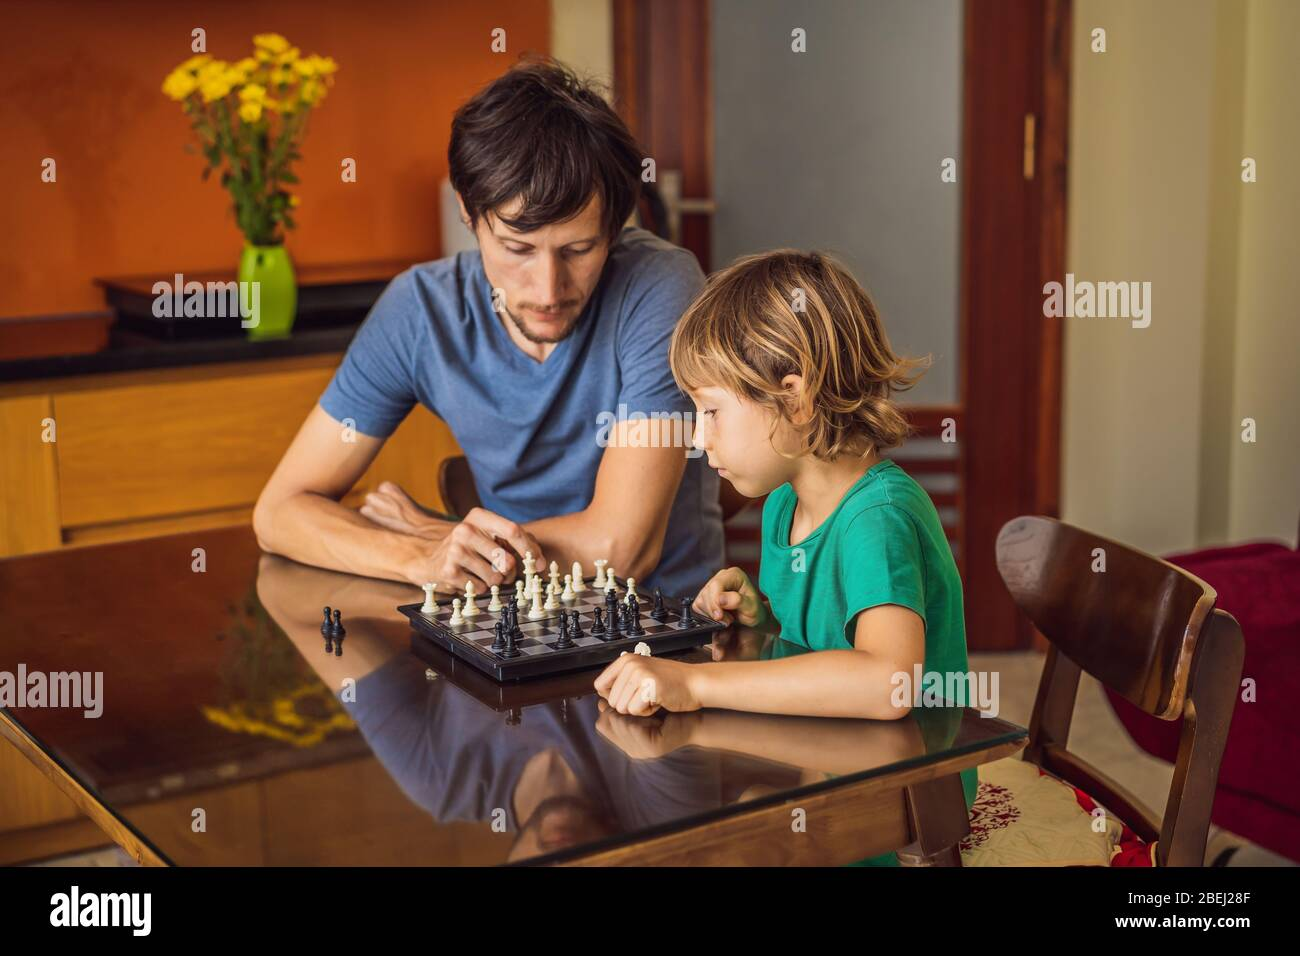 Happy Family spielen Brettspiel zu Hause Stockfoto